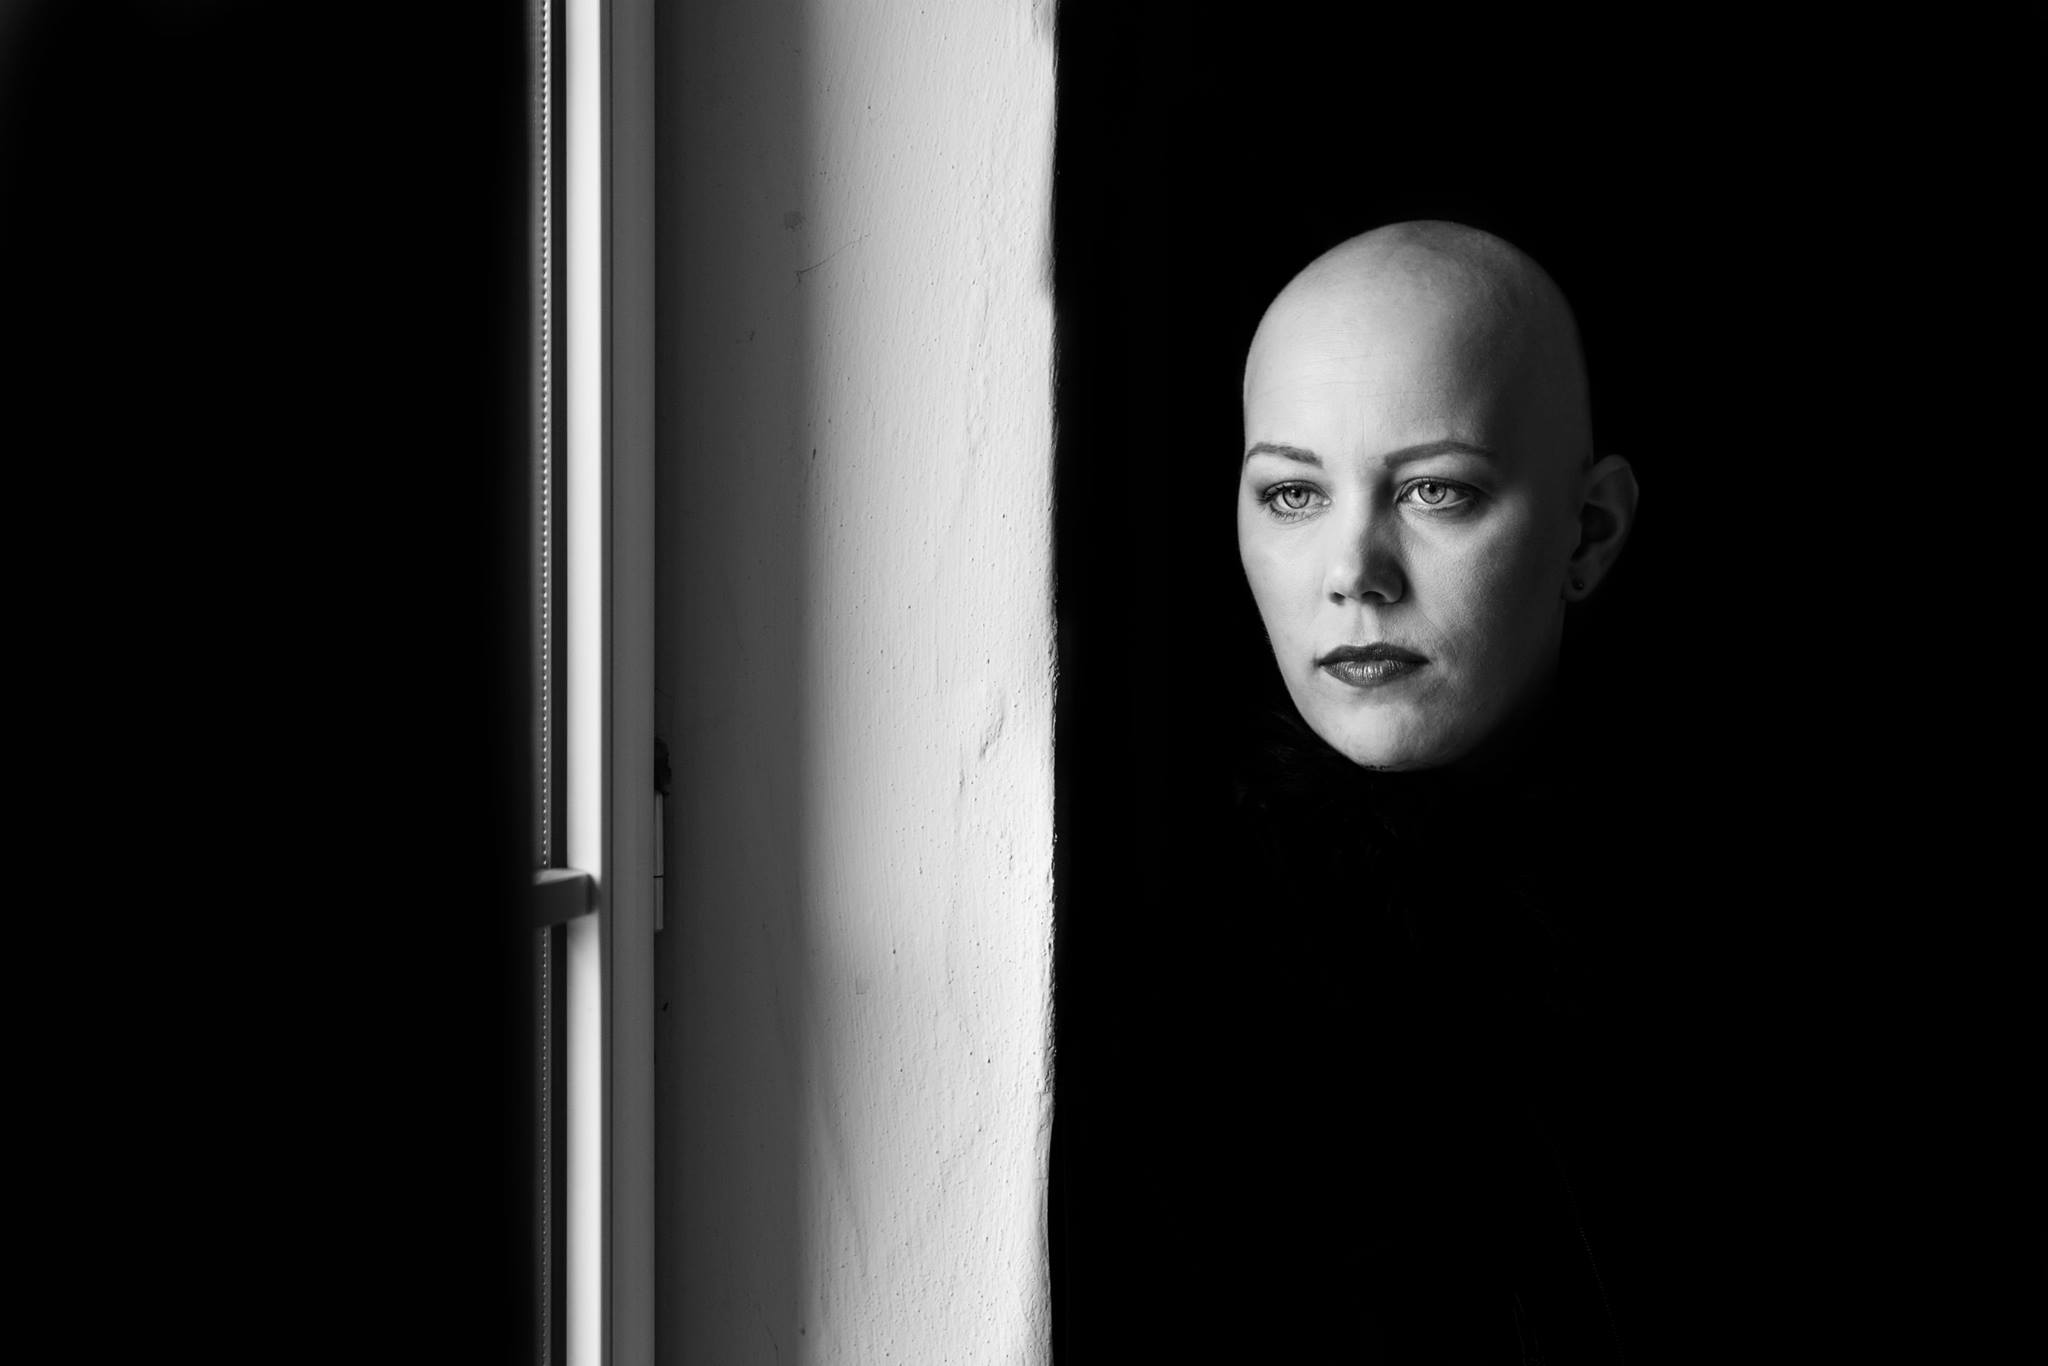 Harald Peter, Christine Raab, Aschaffenburg, schwarz-weiß, Glatze, Frau, Fotoshooting, Make-Up Artist, (3)